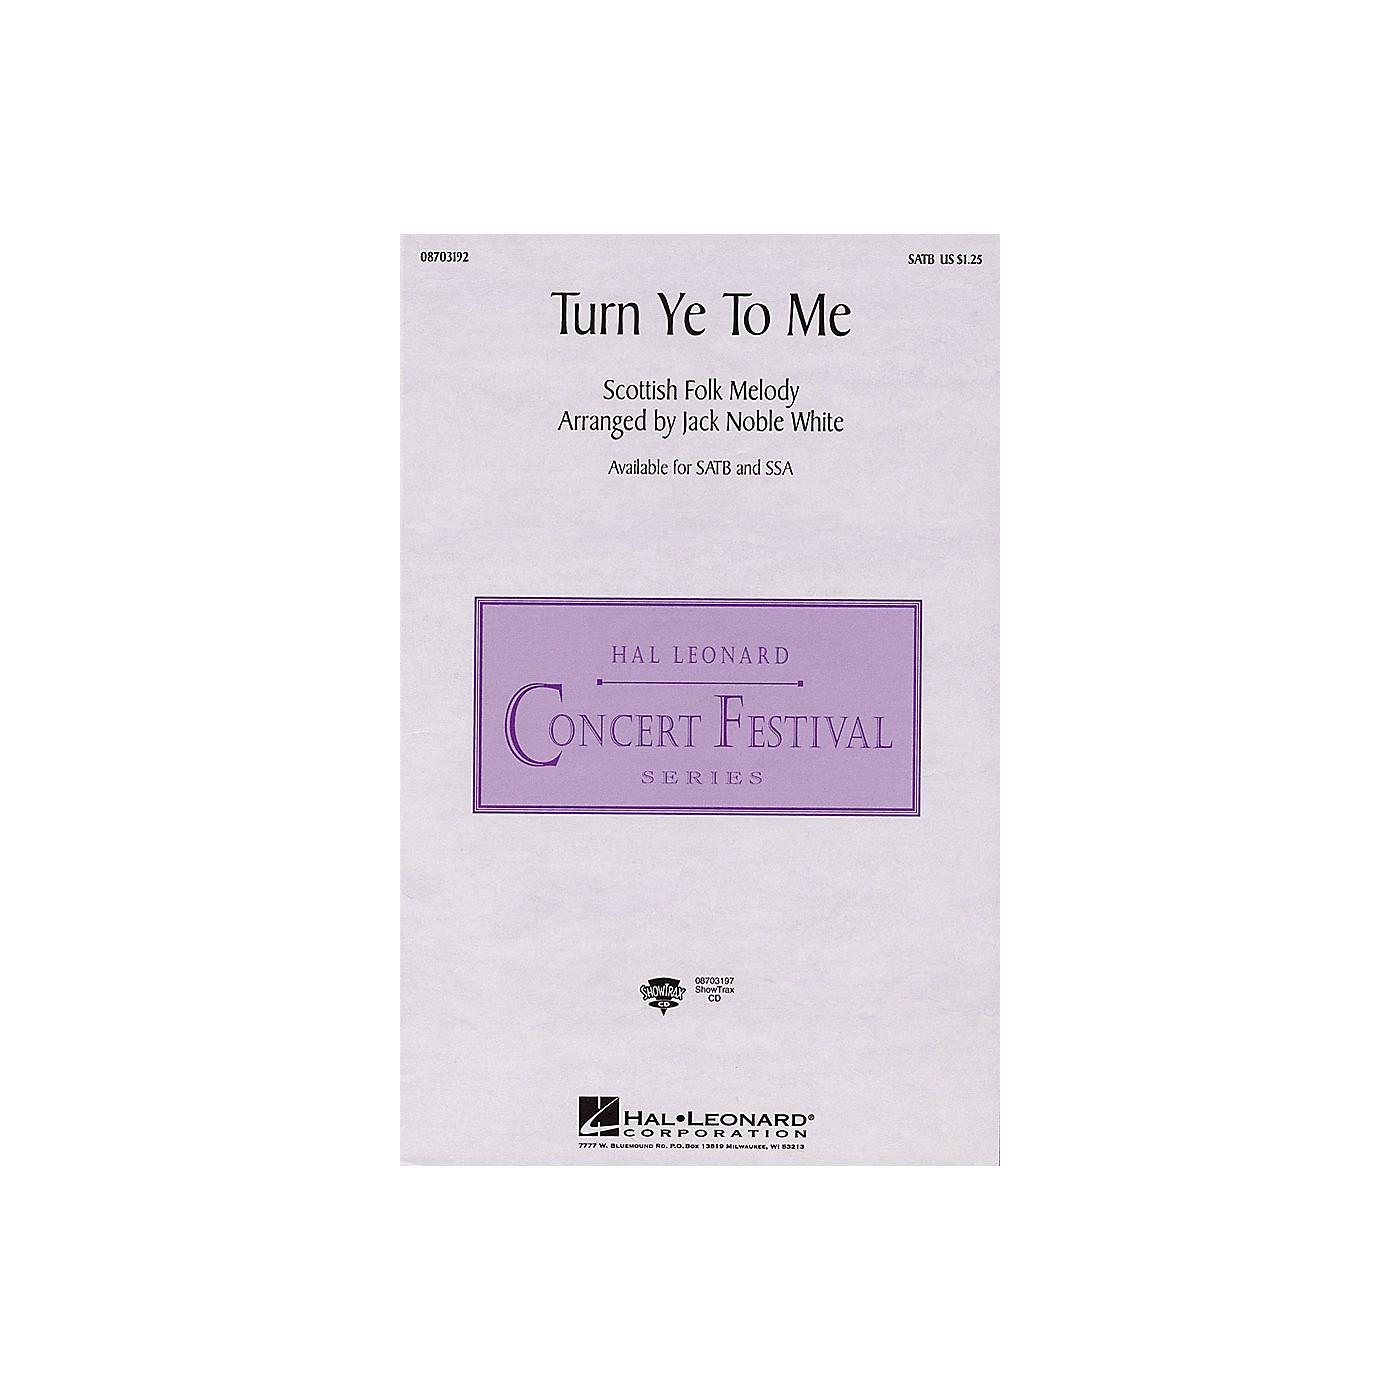 Hal Leonard Turn Ye to Me SSA Arranged by Jack Noble White thumbnail